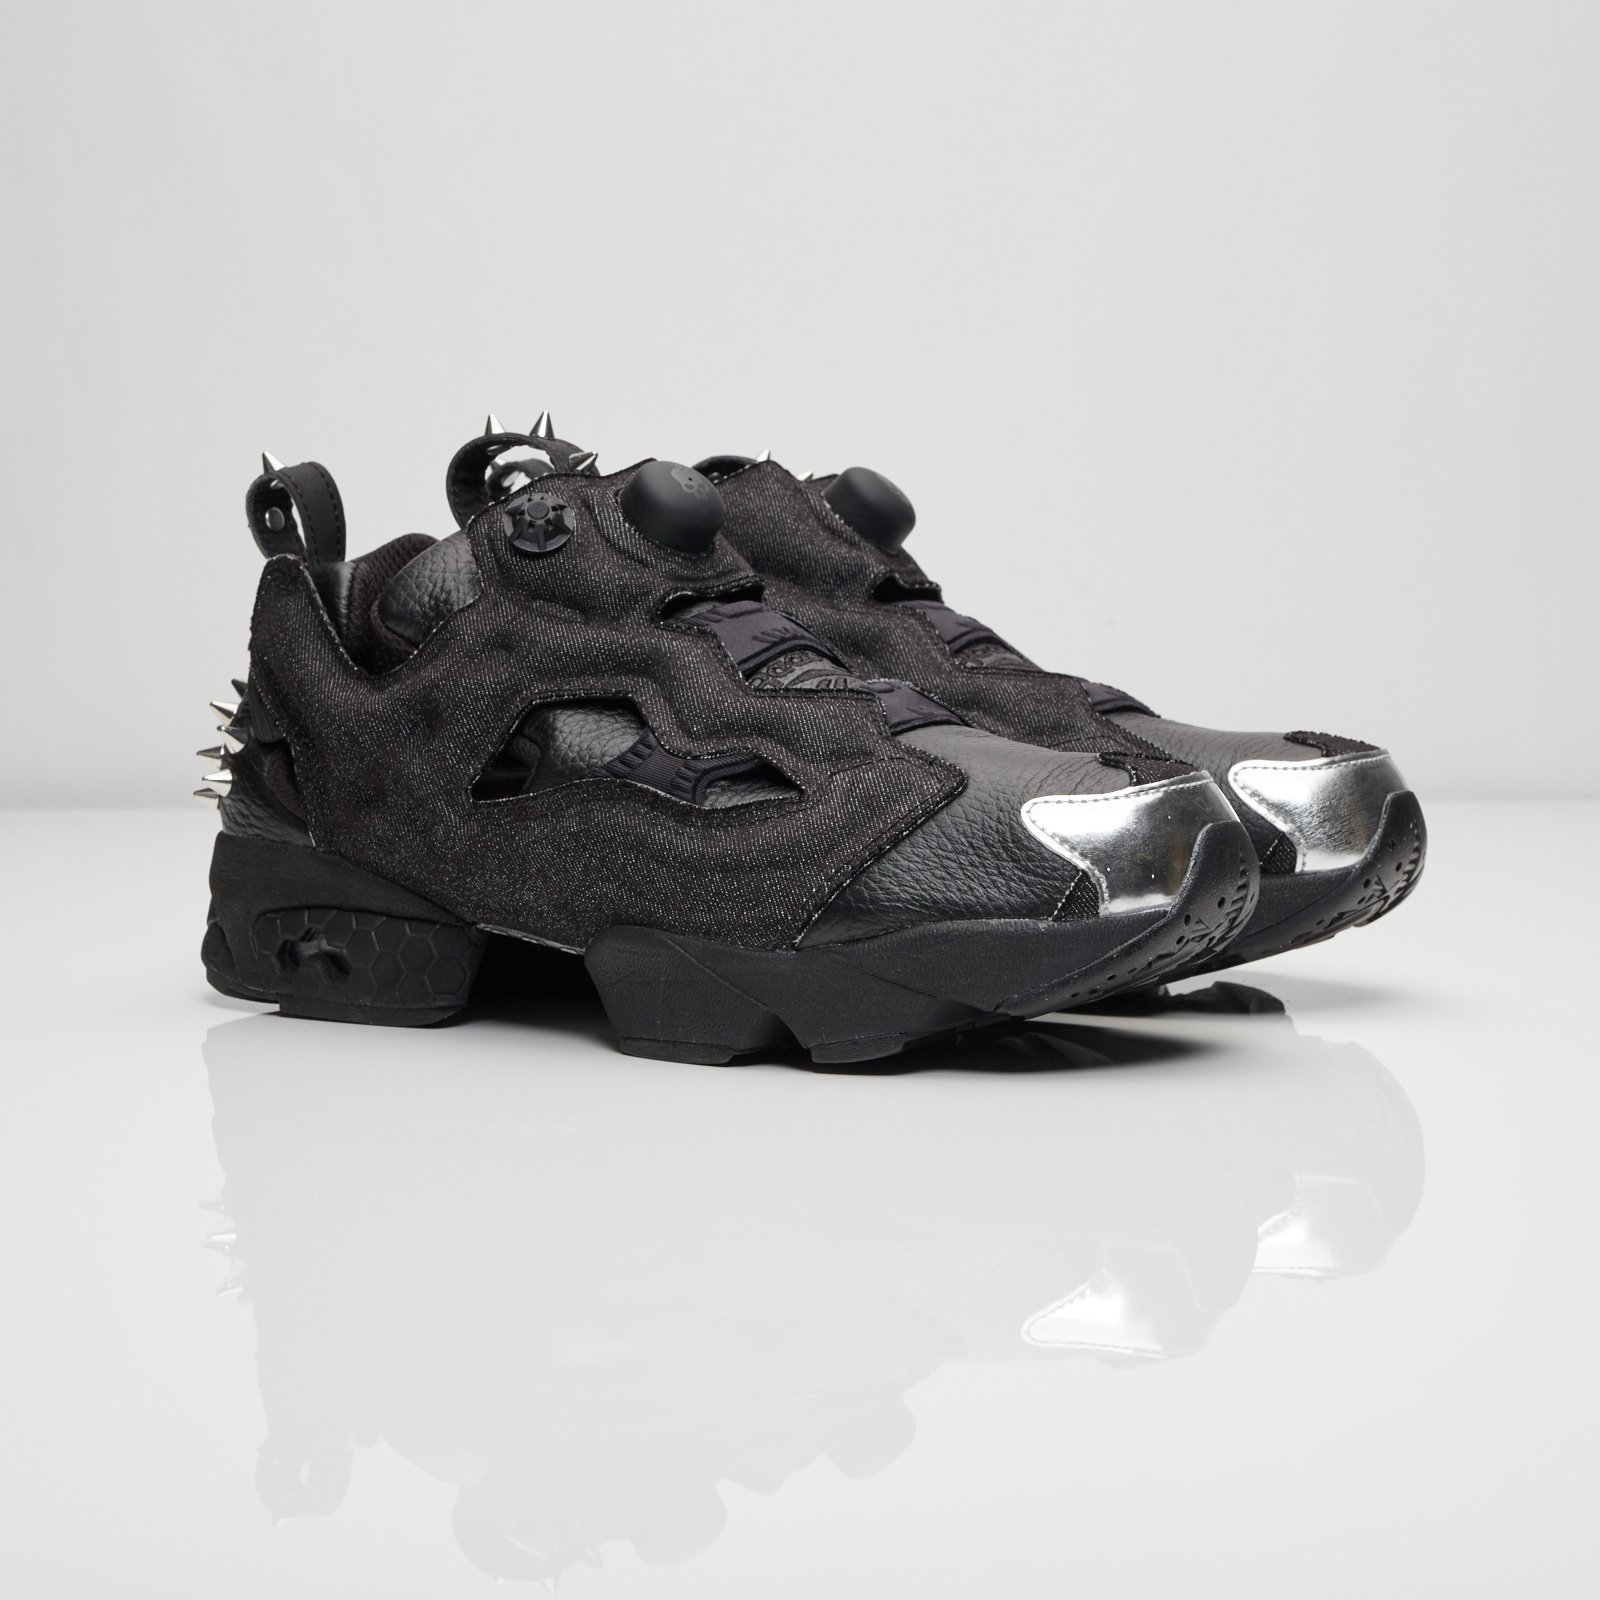 Reebok Instapump Fury OG Halloween - Ar1716 - Sneakersnstuff ... 88d391927